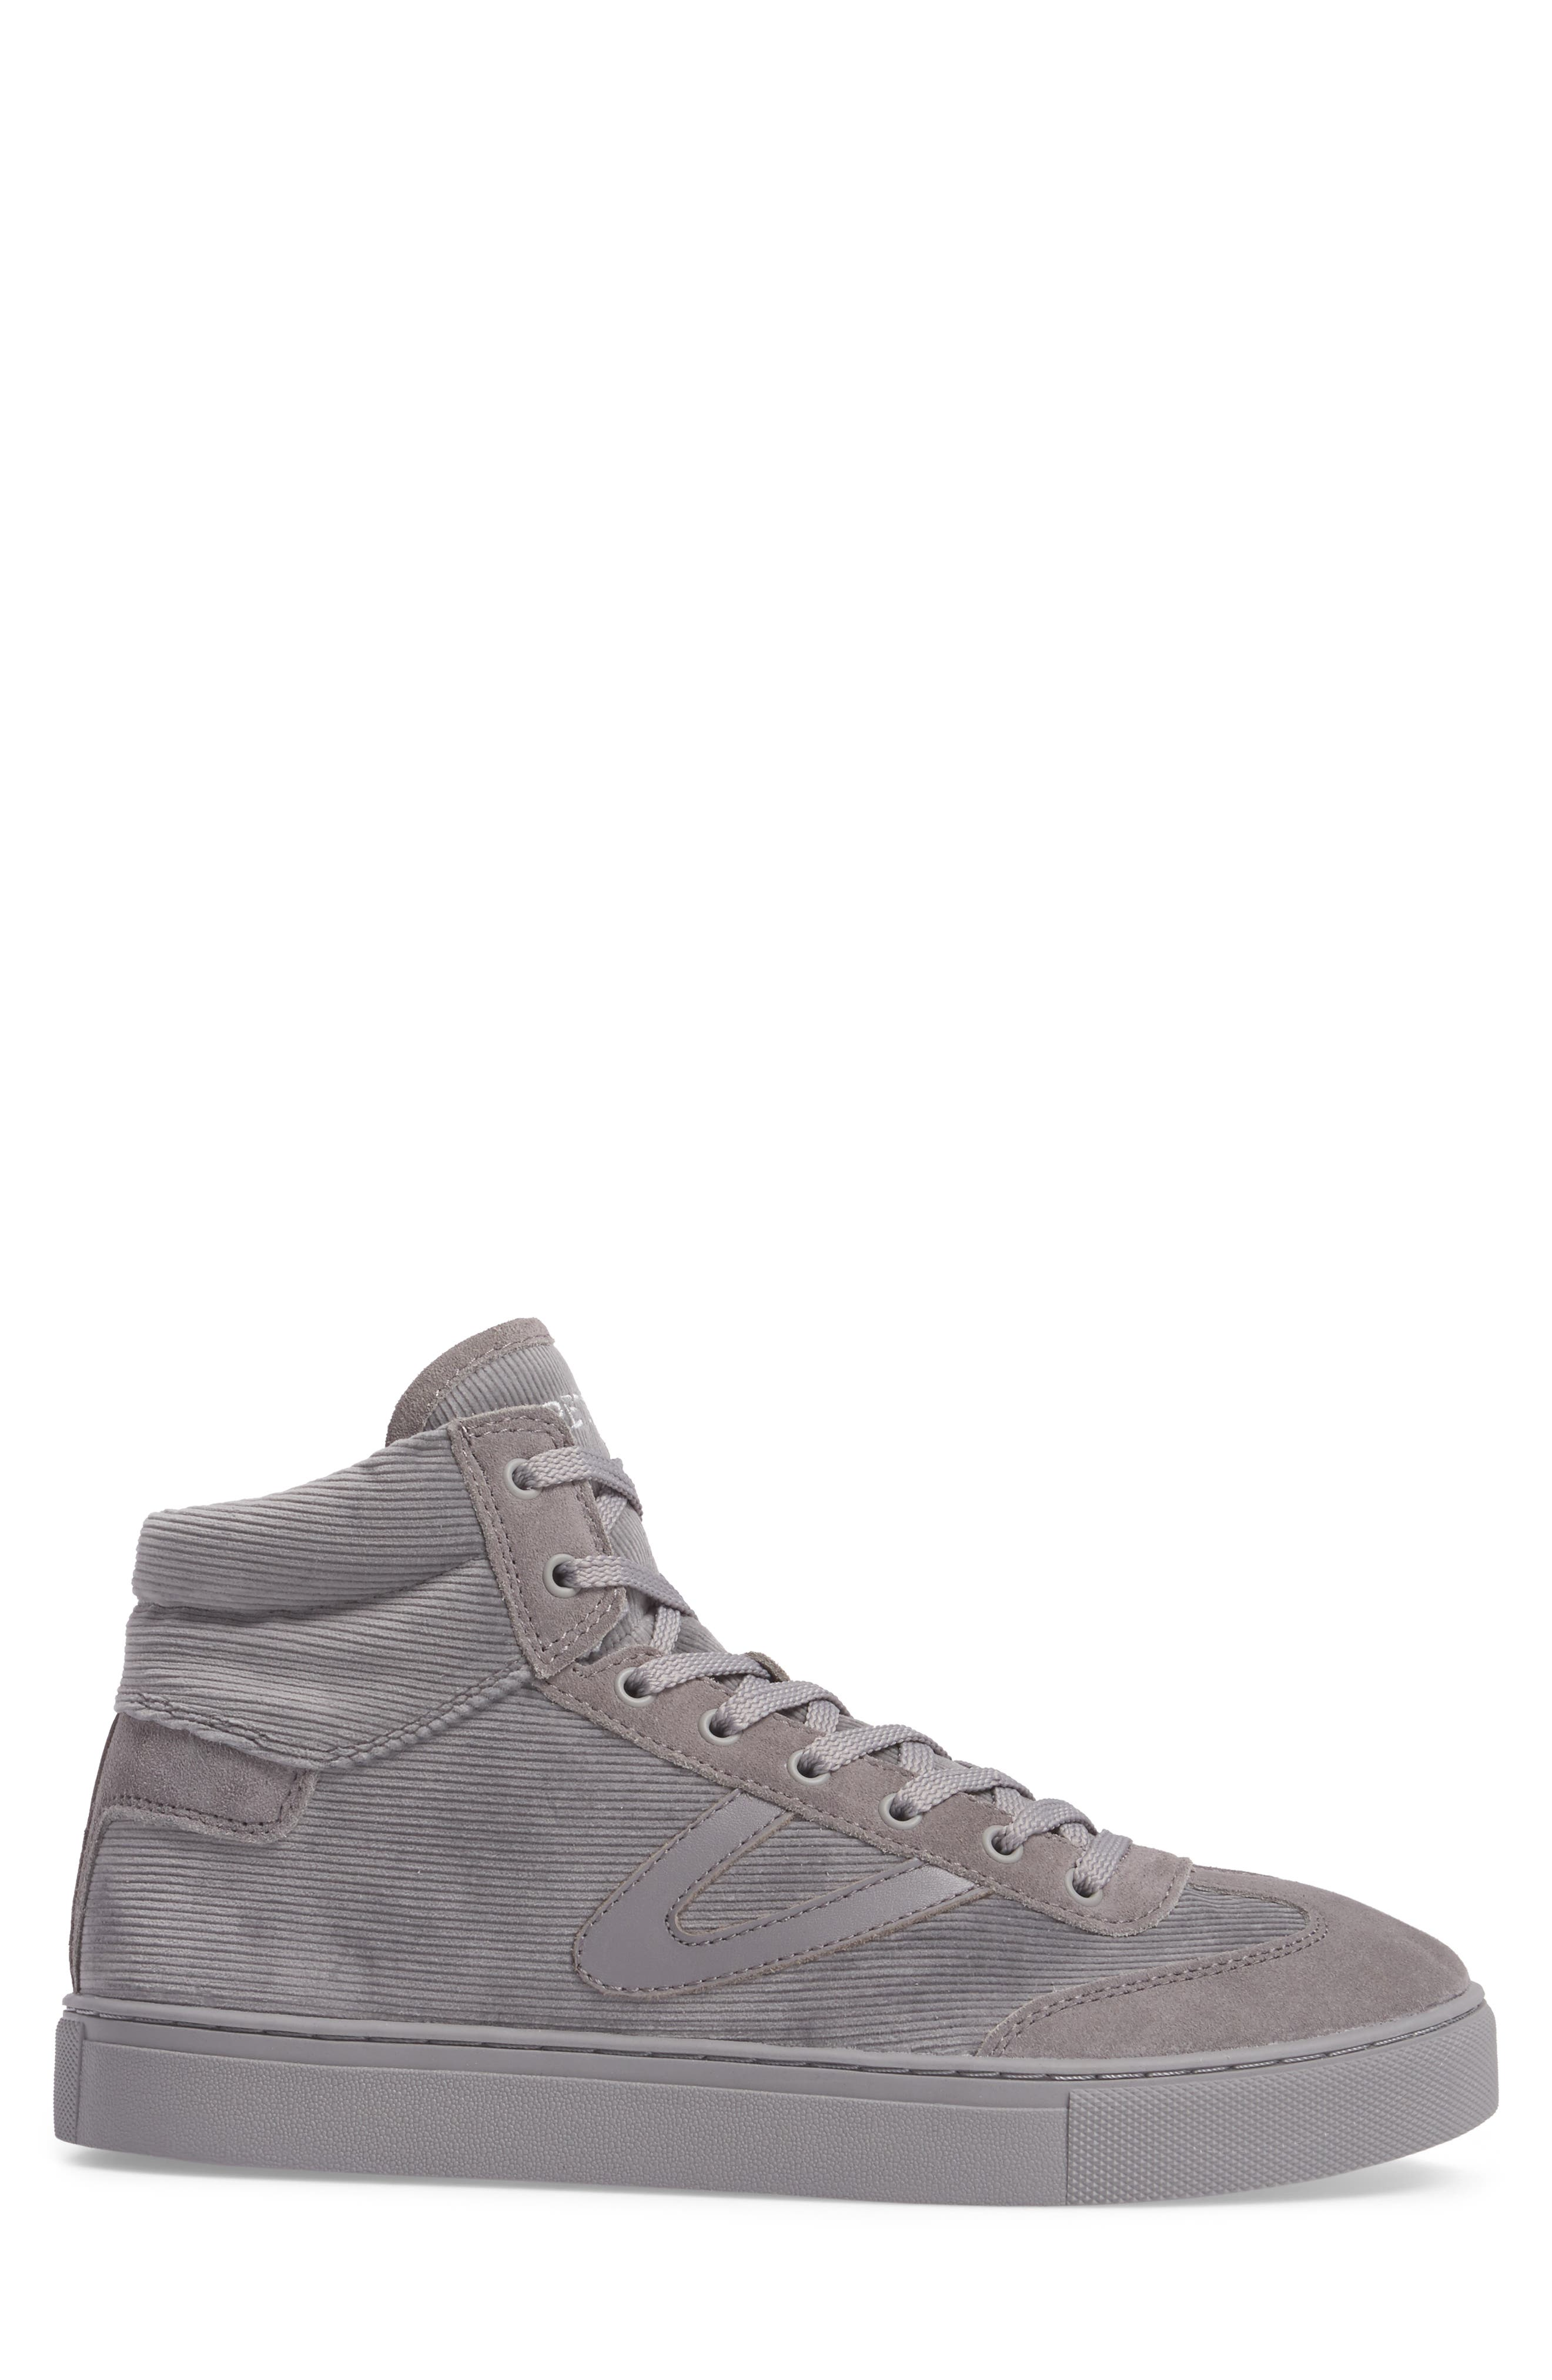 Jack High Top Sneaker,                             Alternate thumbnail 5, color,